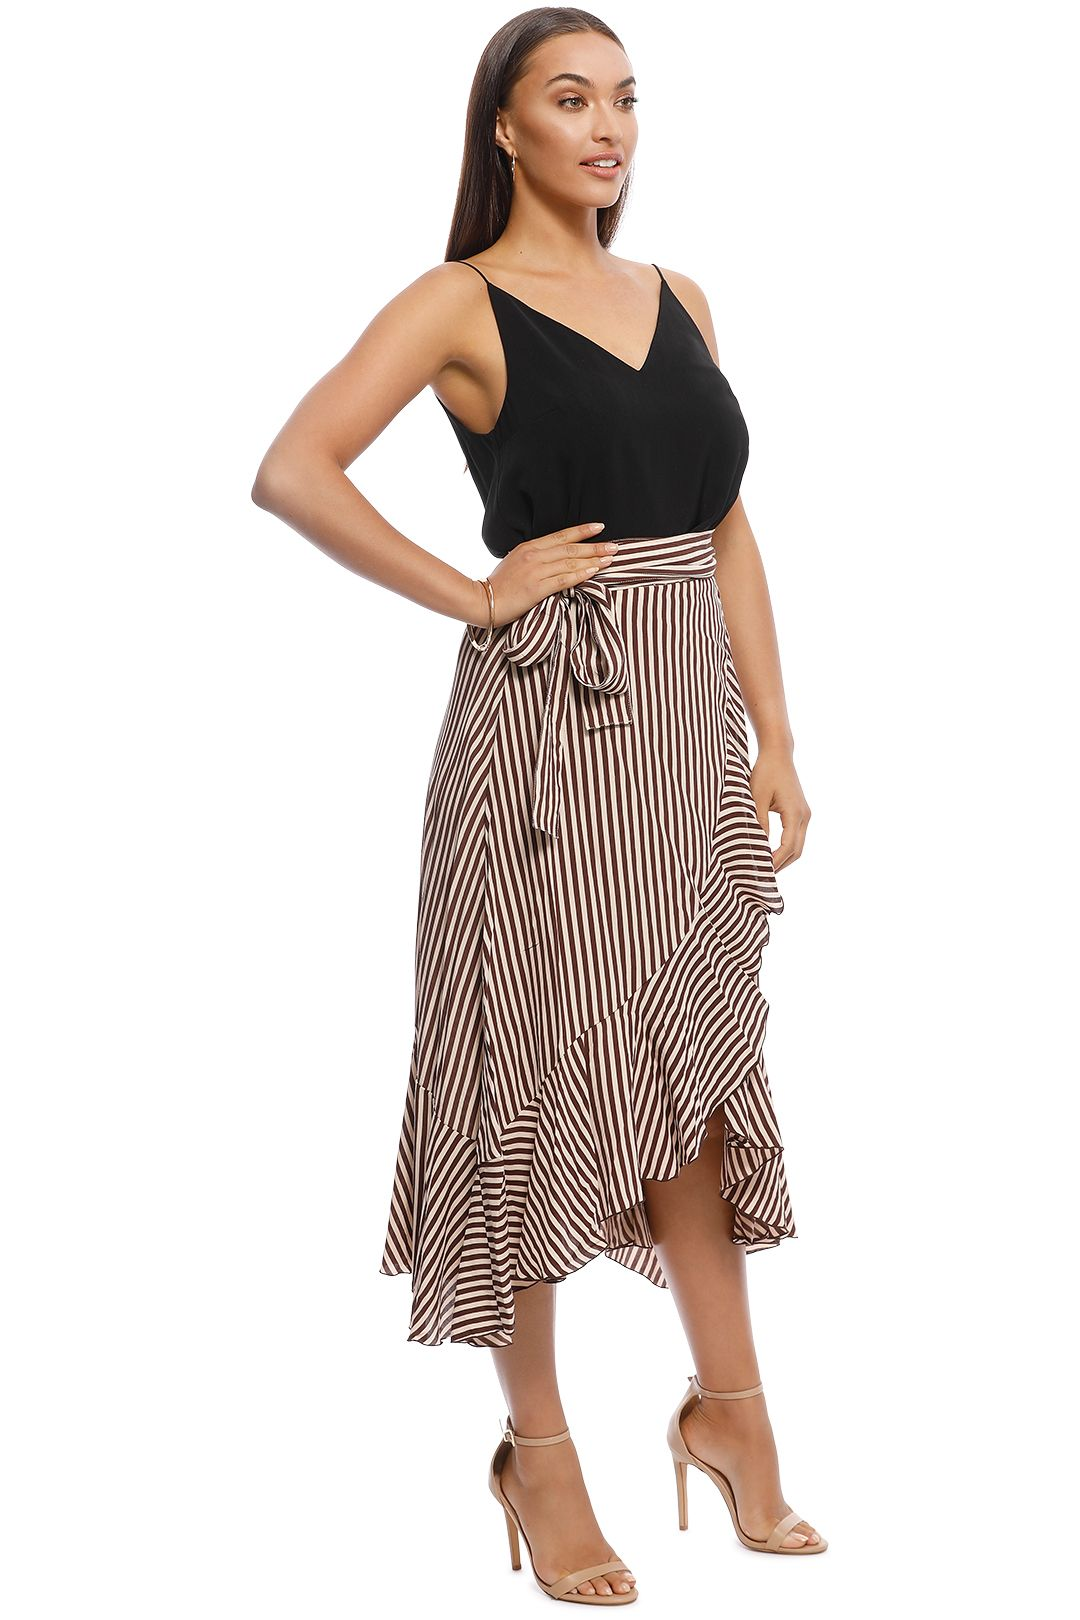 Faithfull - Tramonti Skirt - Georgia Stripe Espresso - Side